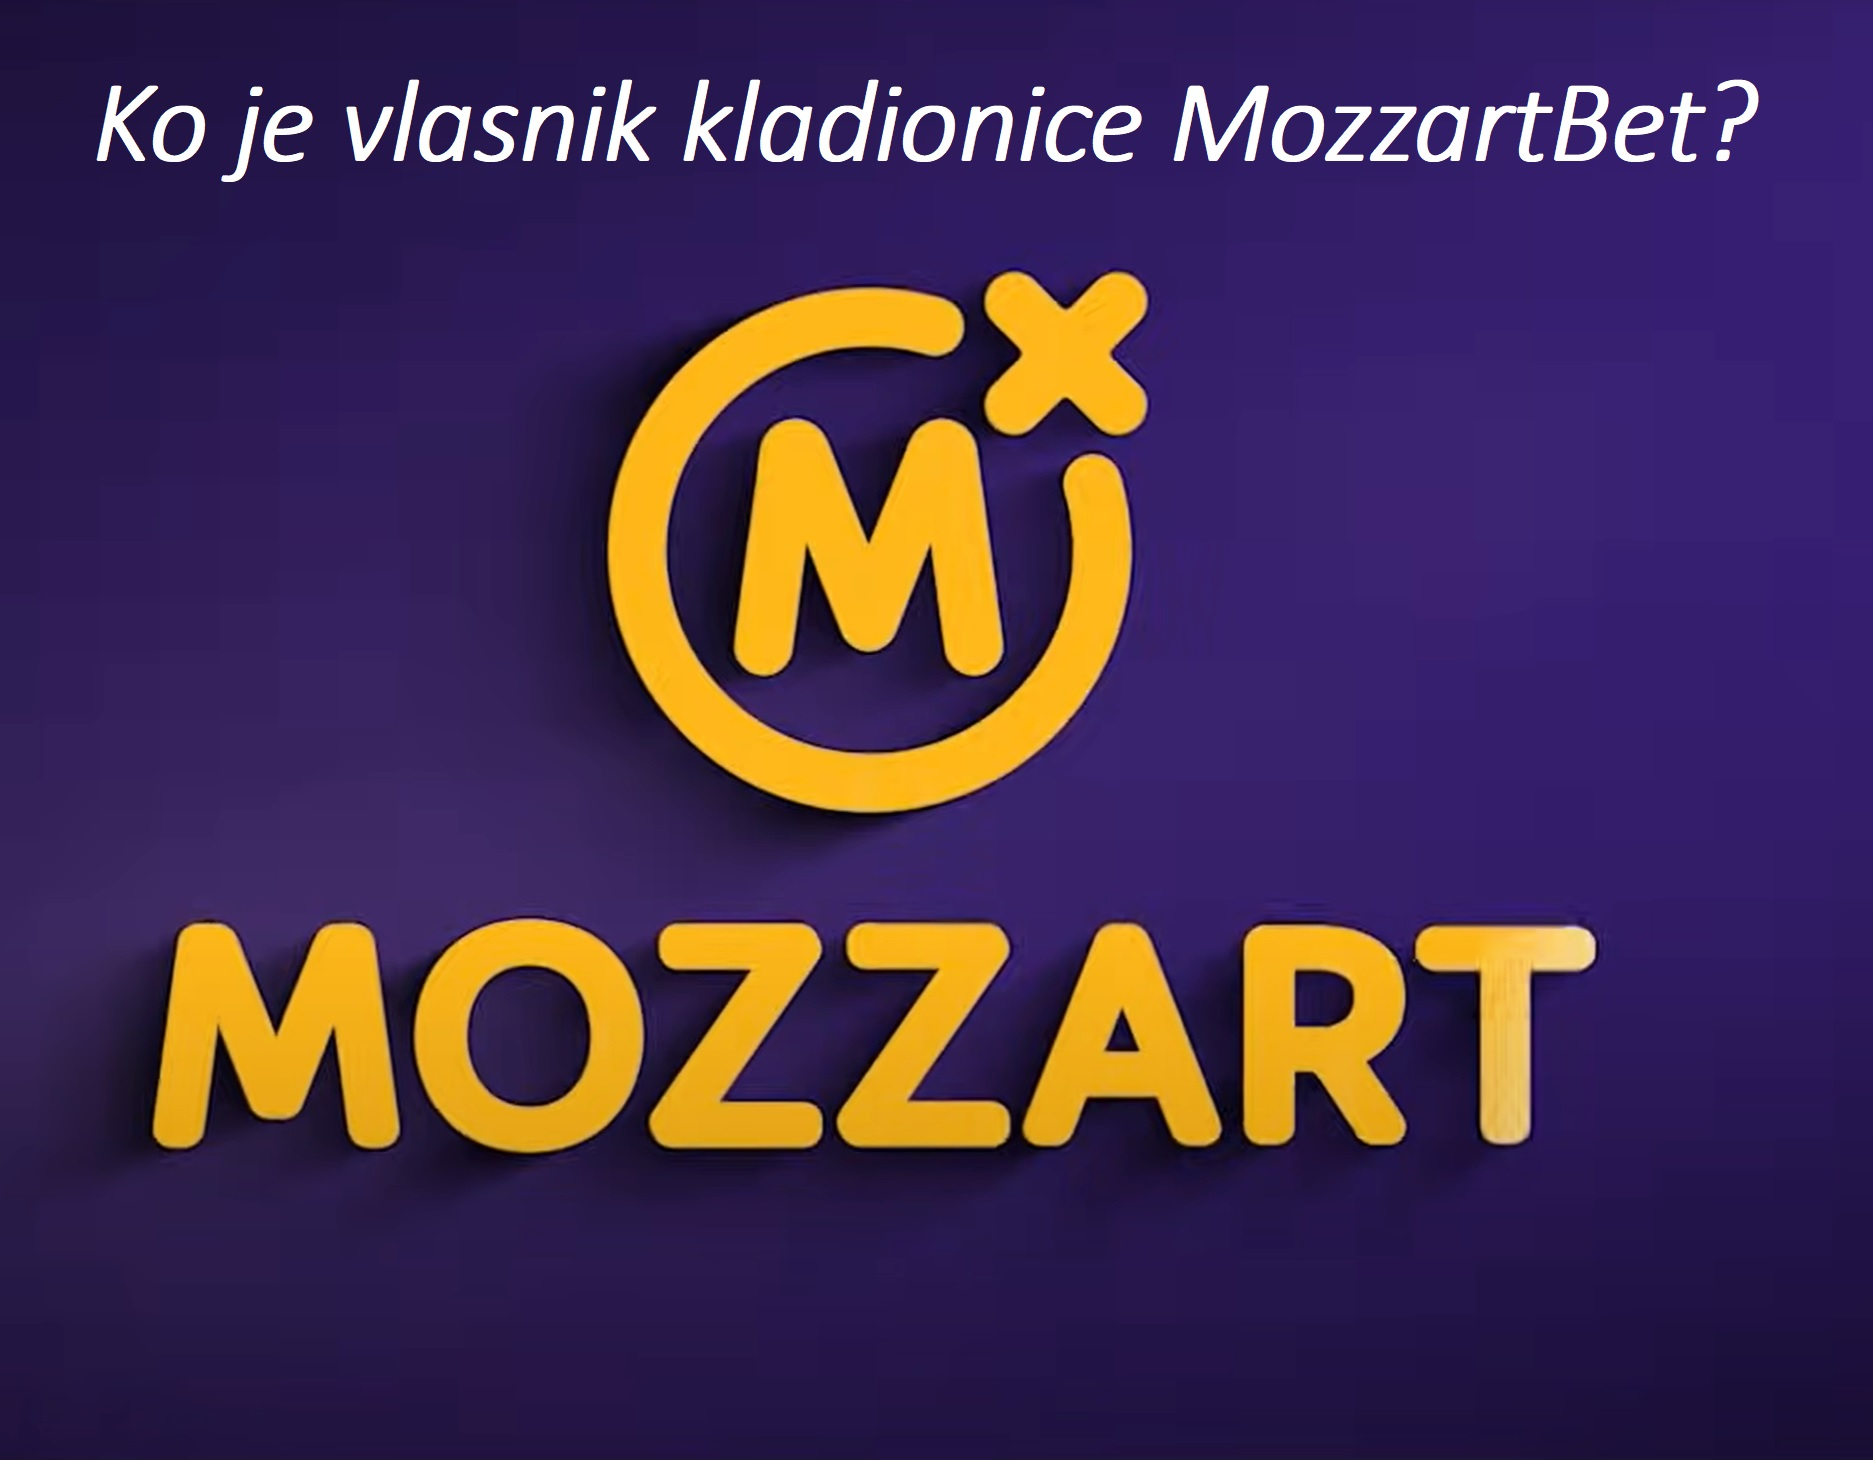 Ko je vlasnik kladionice MozzartBet?